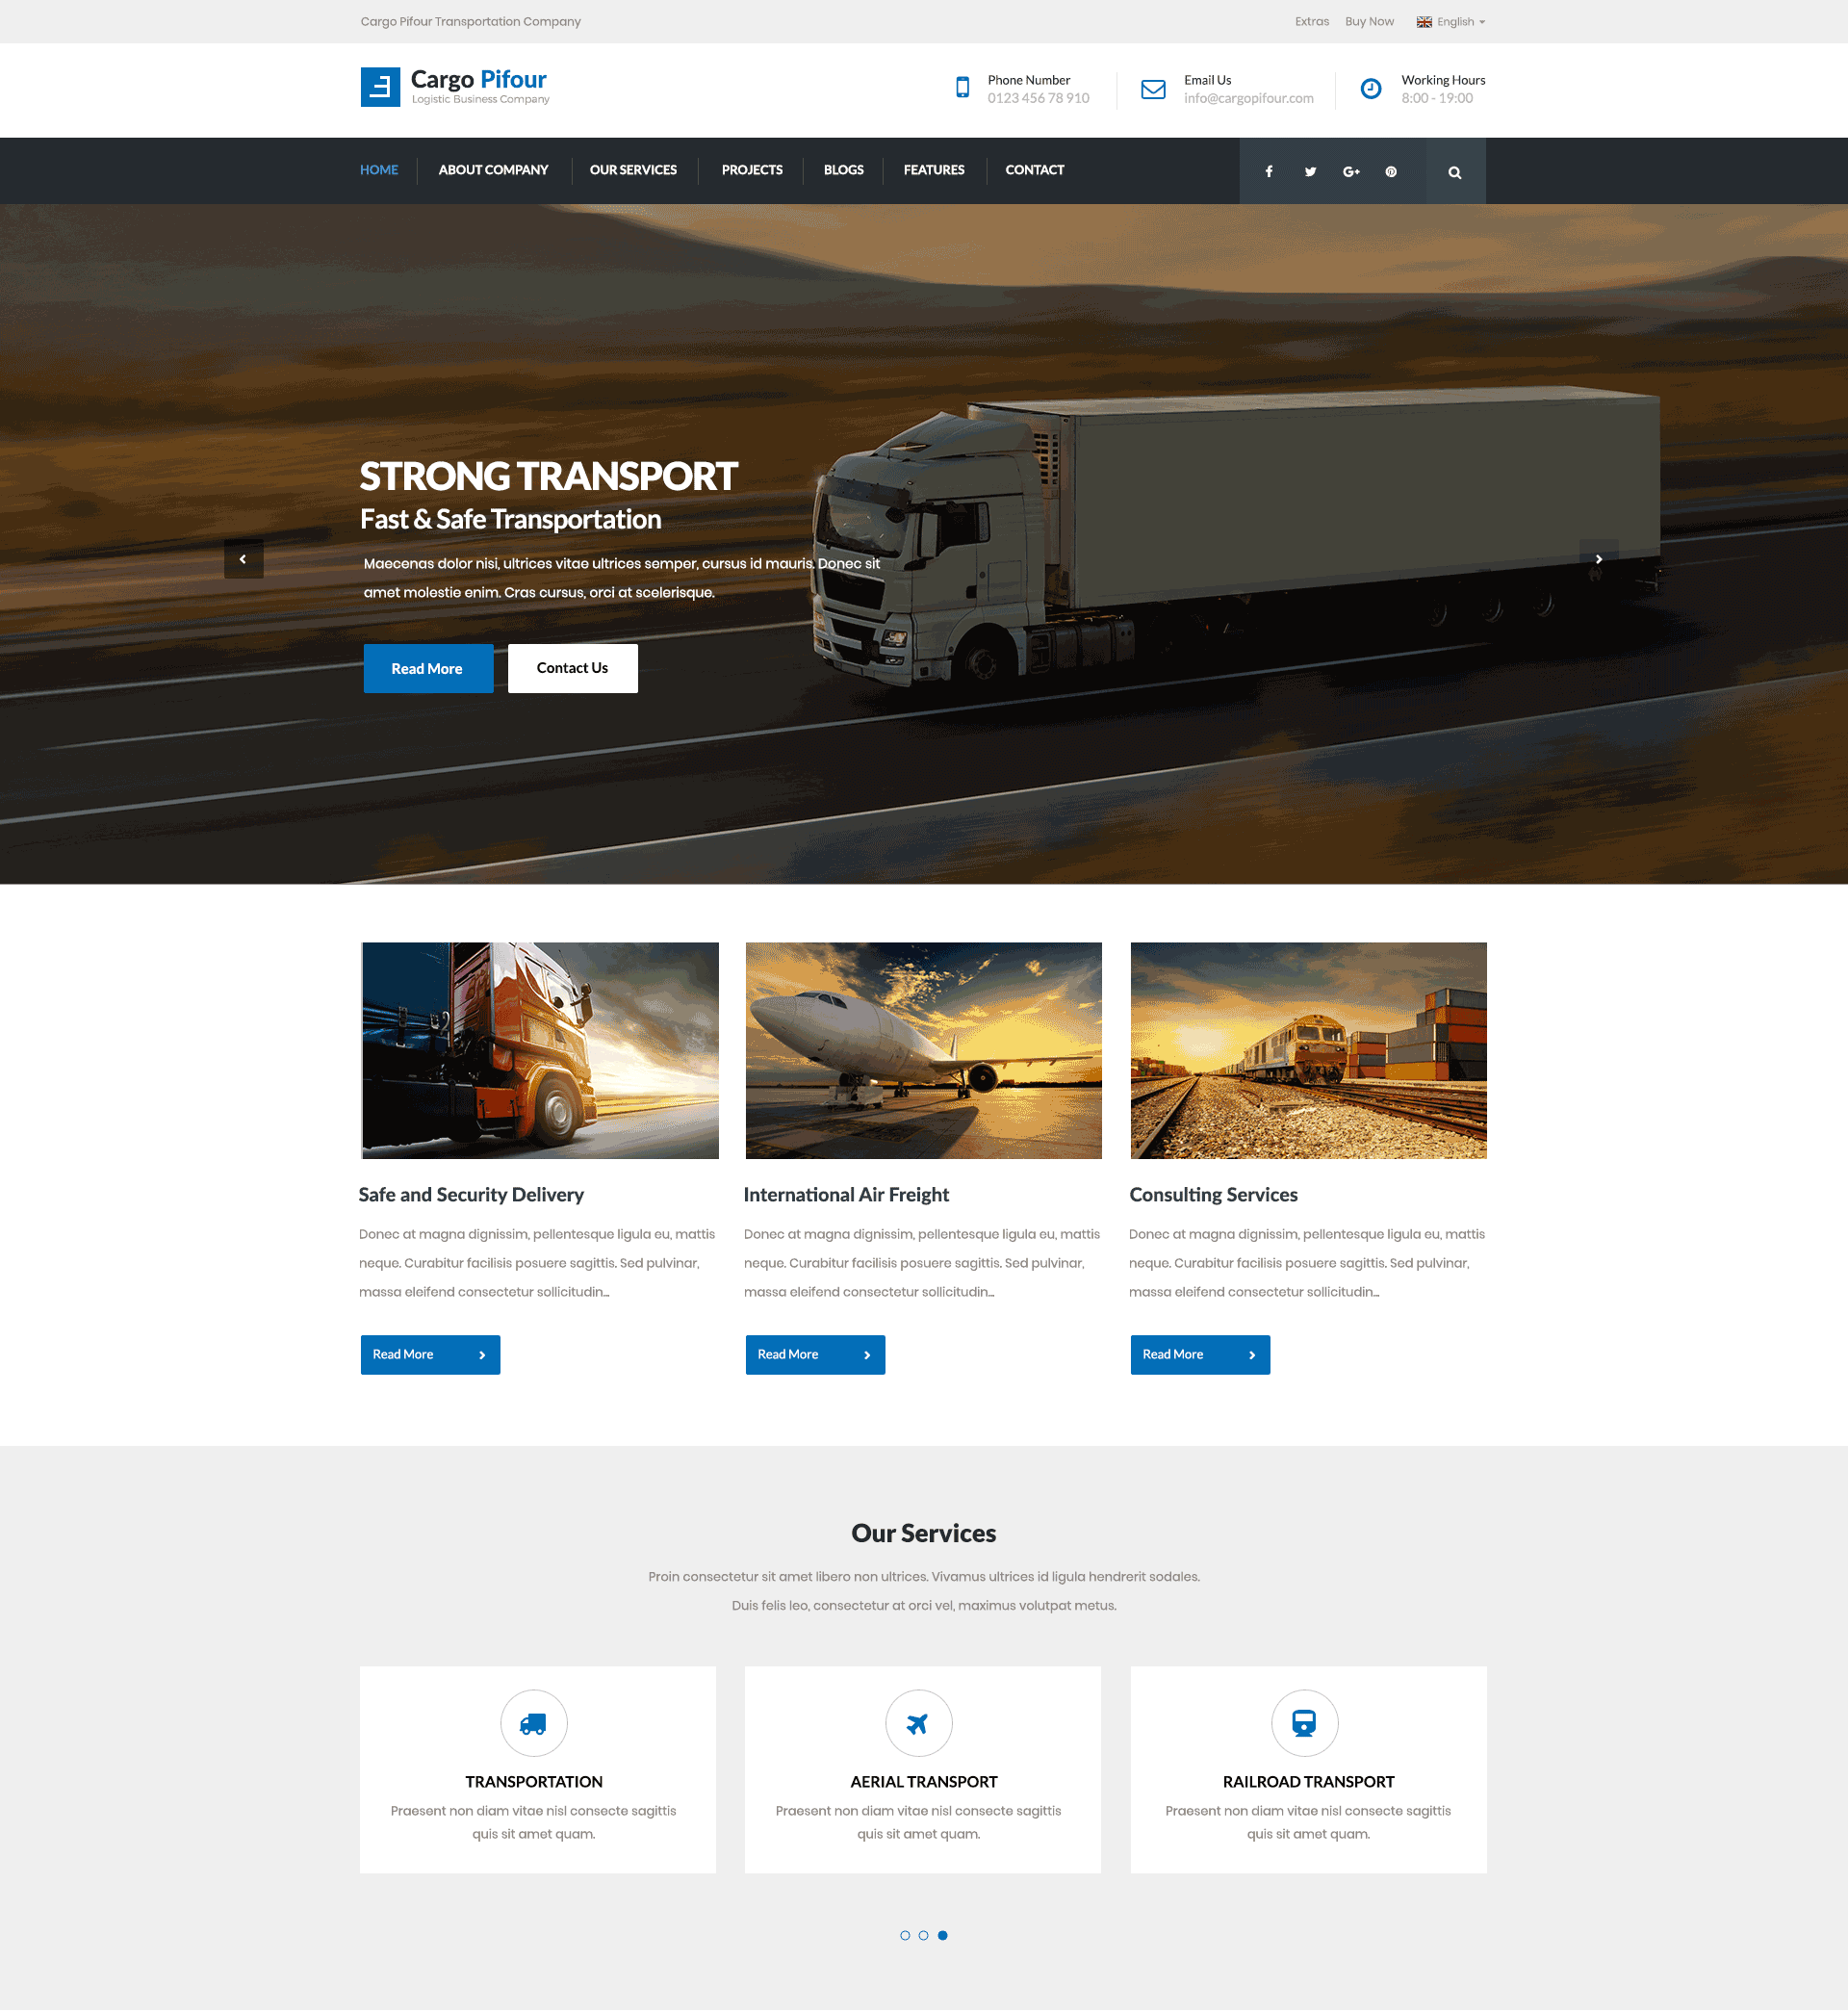 cargo pifour